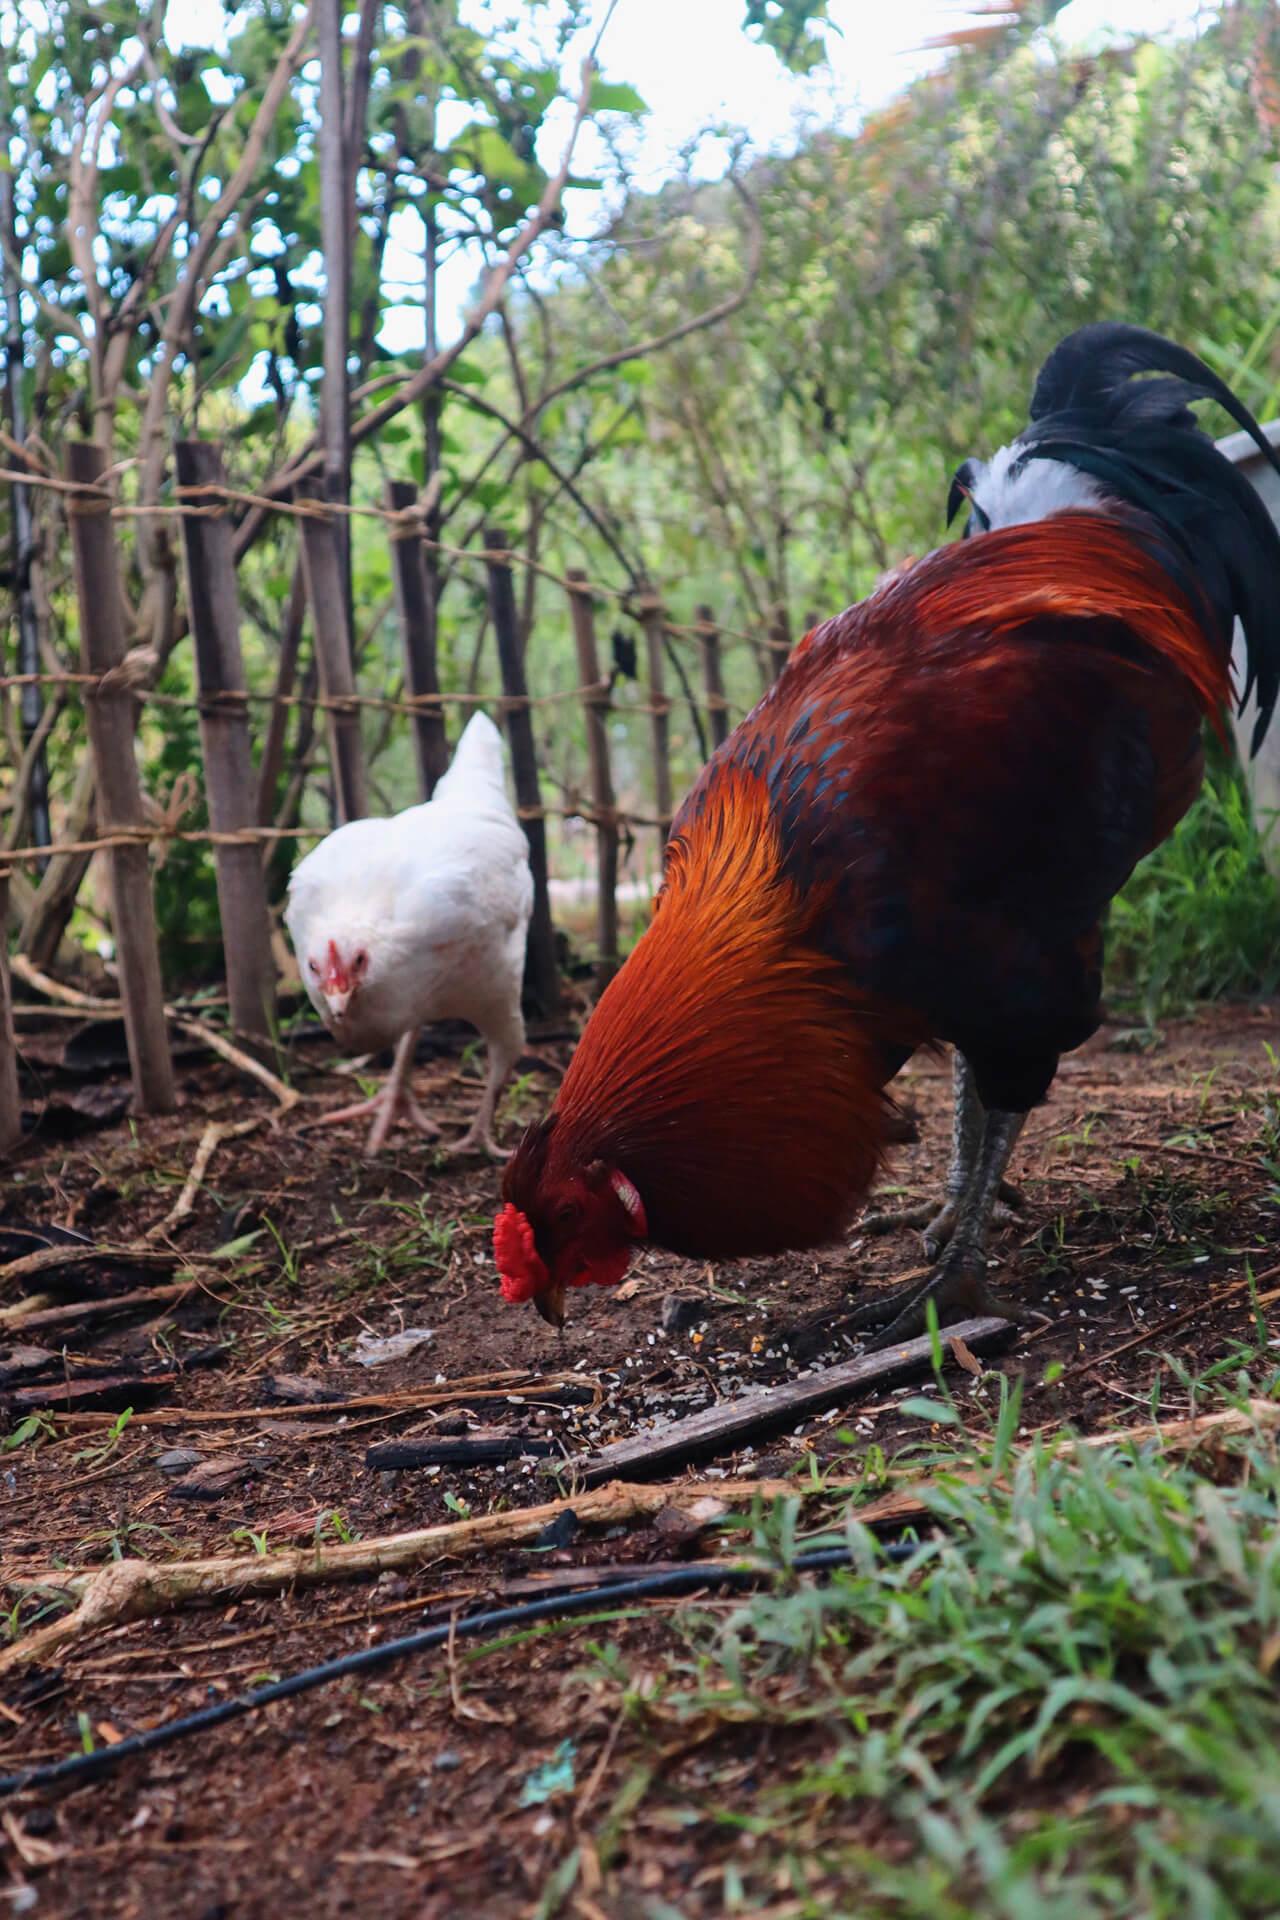 Chickens feeding around the Alpas compound